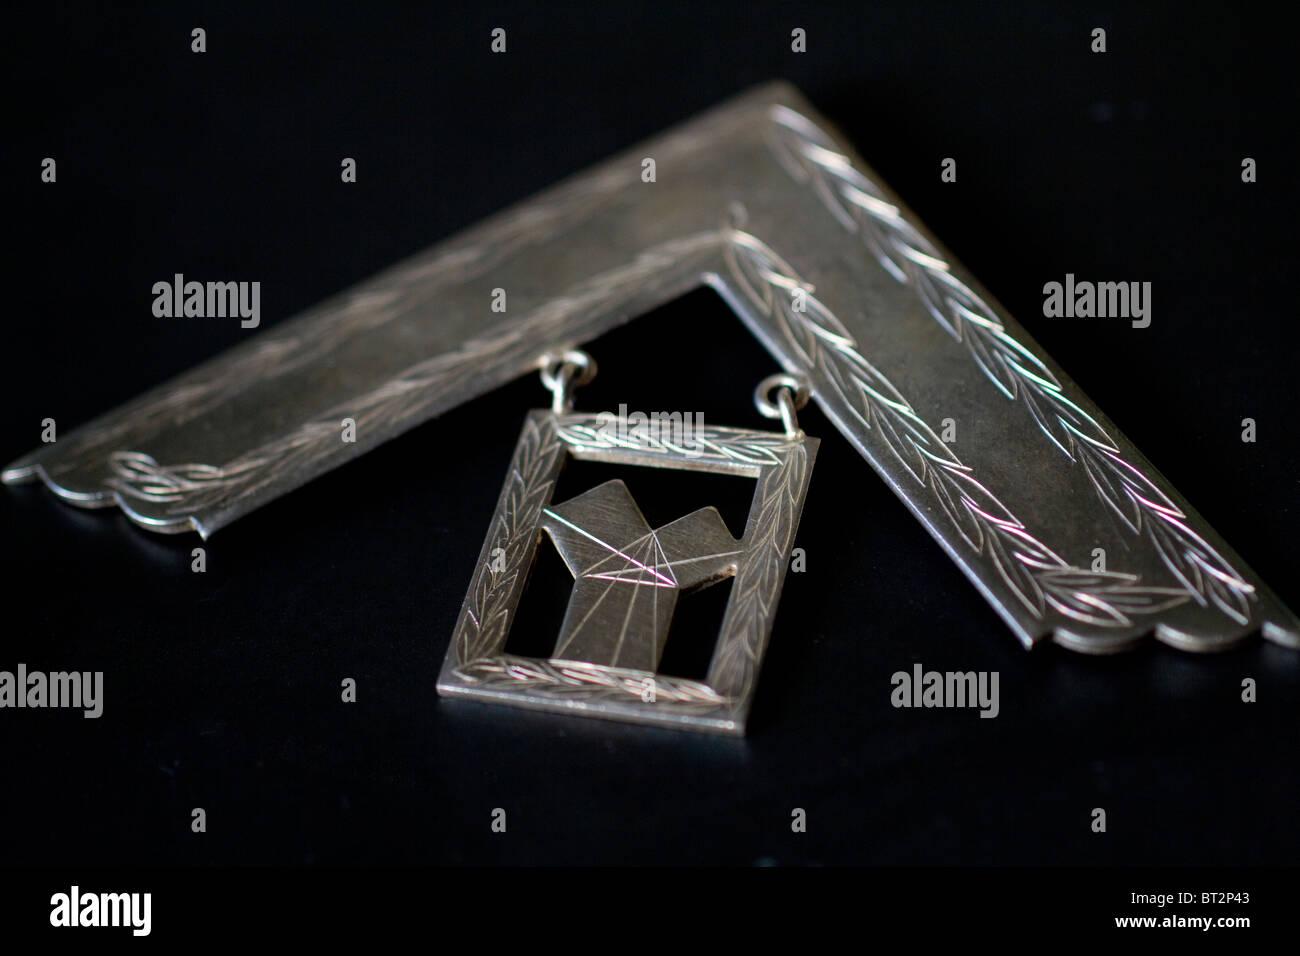 freemason, Masonic Past Master Medal right angled set square symbol. - Stock Image